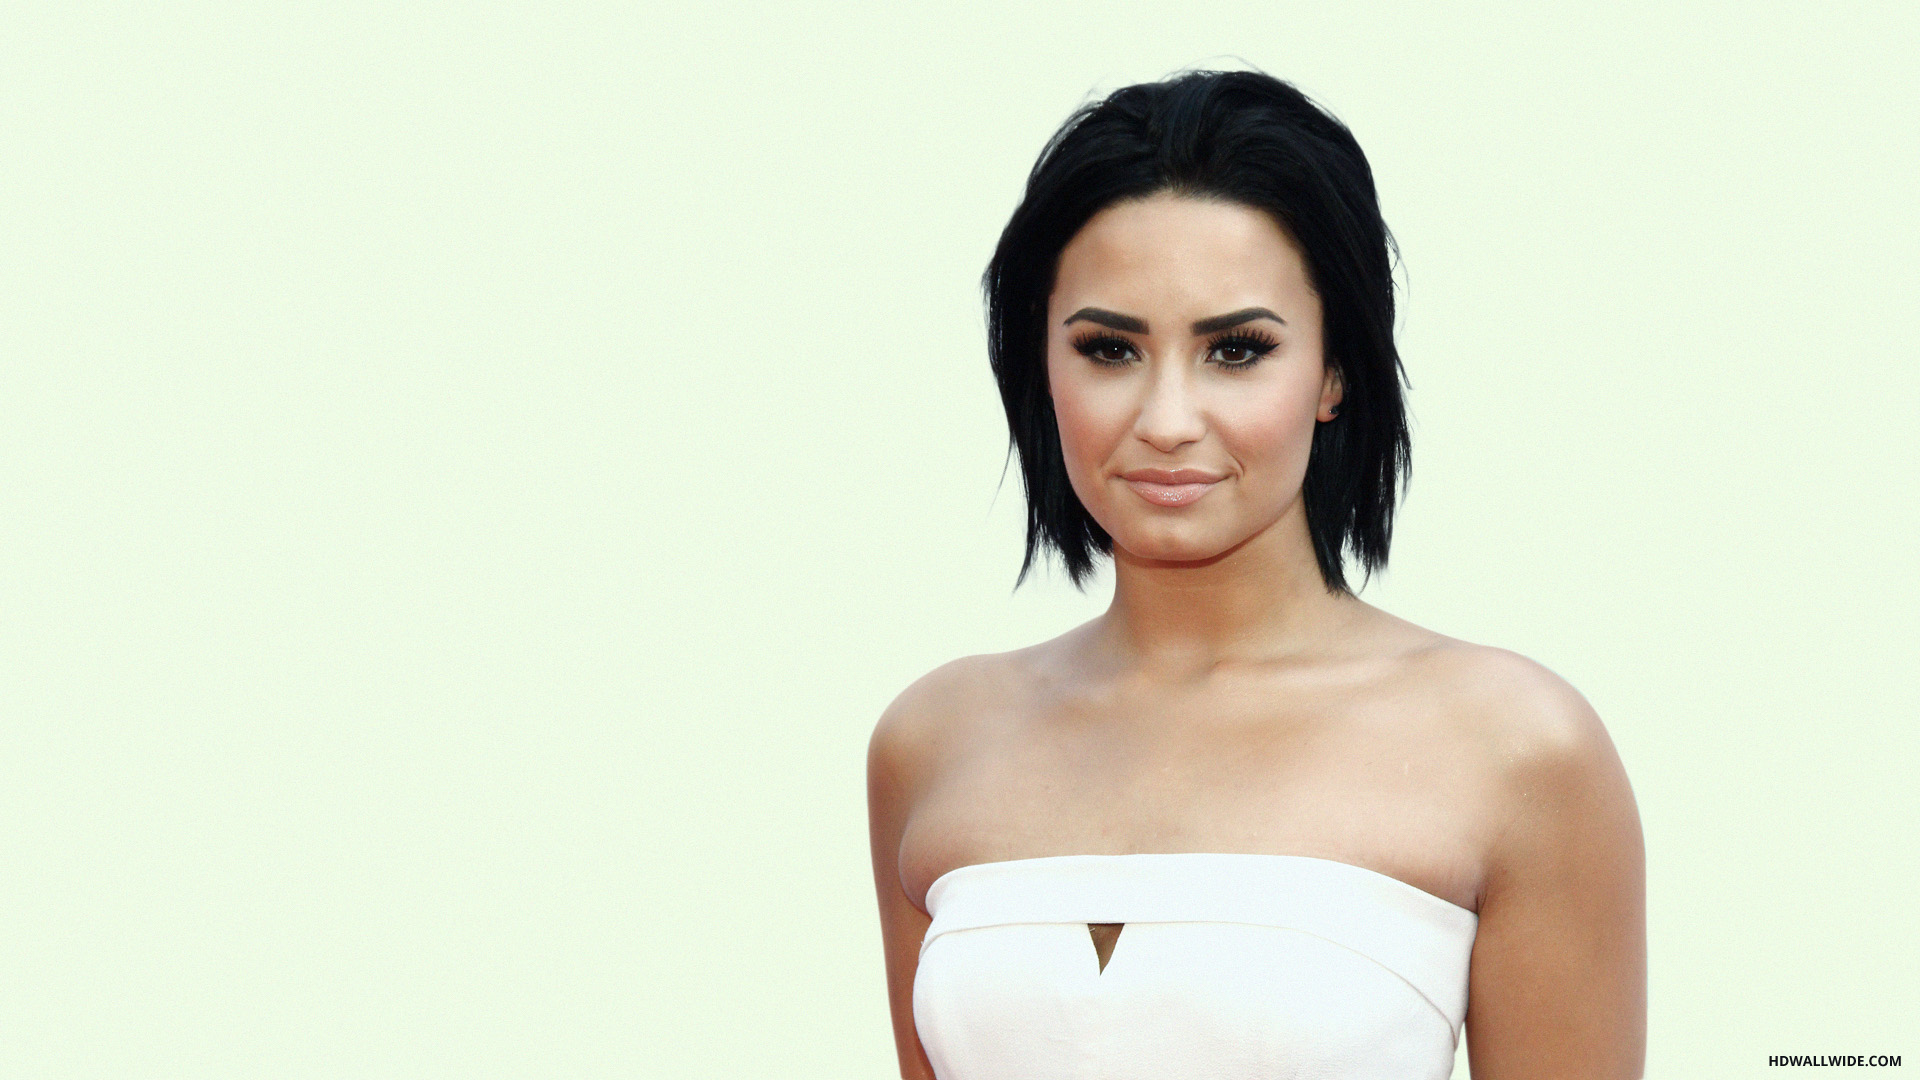 Demi Lovato HD Wallpaper Background Upload at October 23 2015 1920x1080